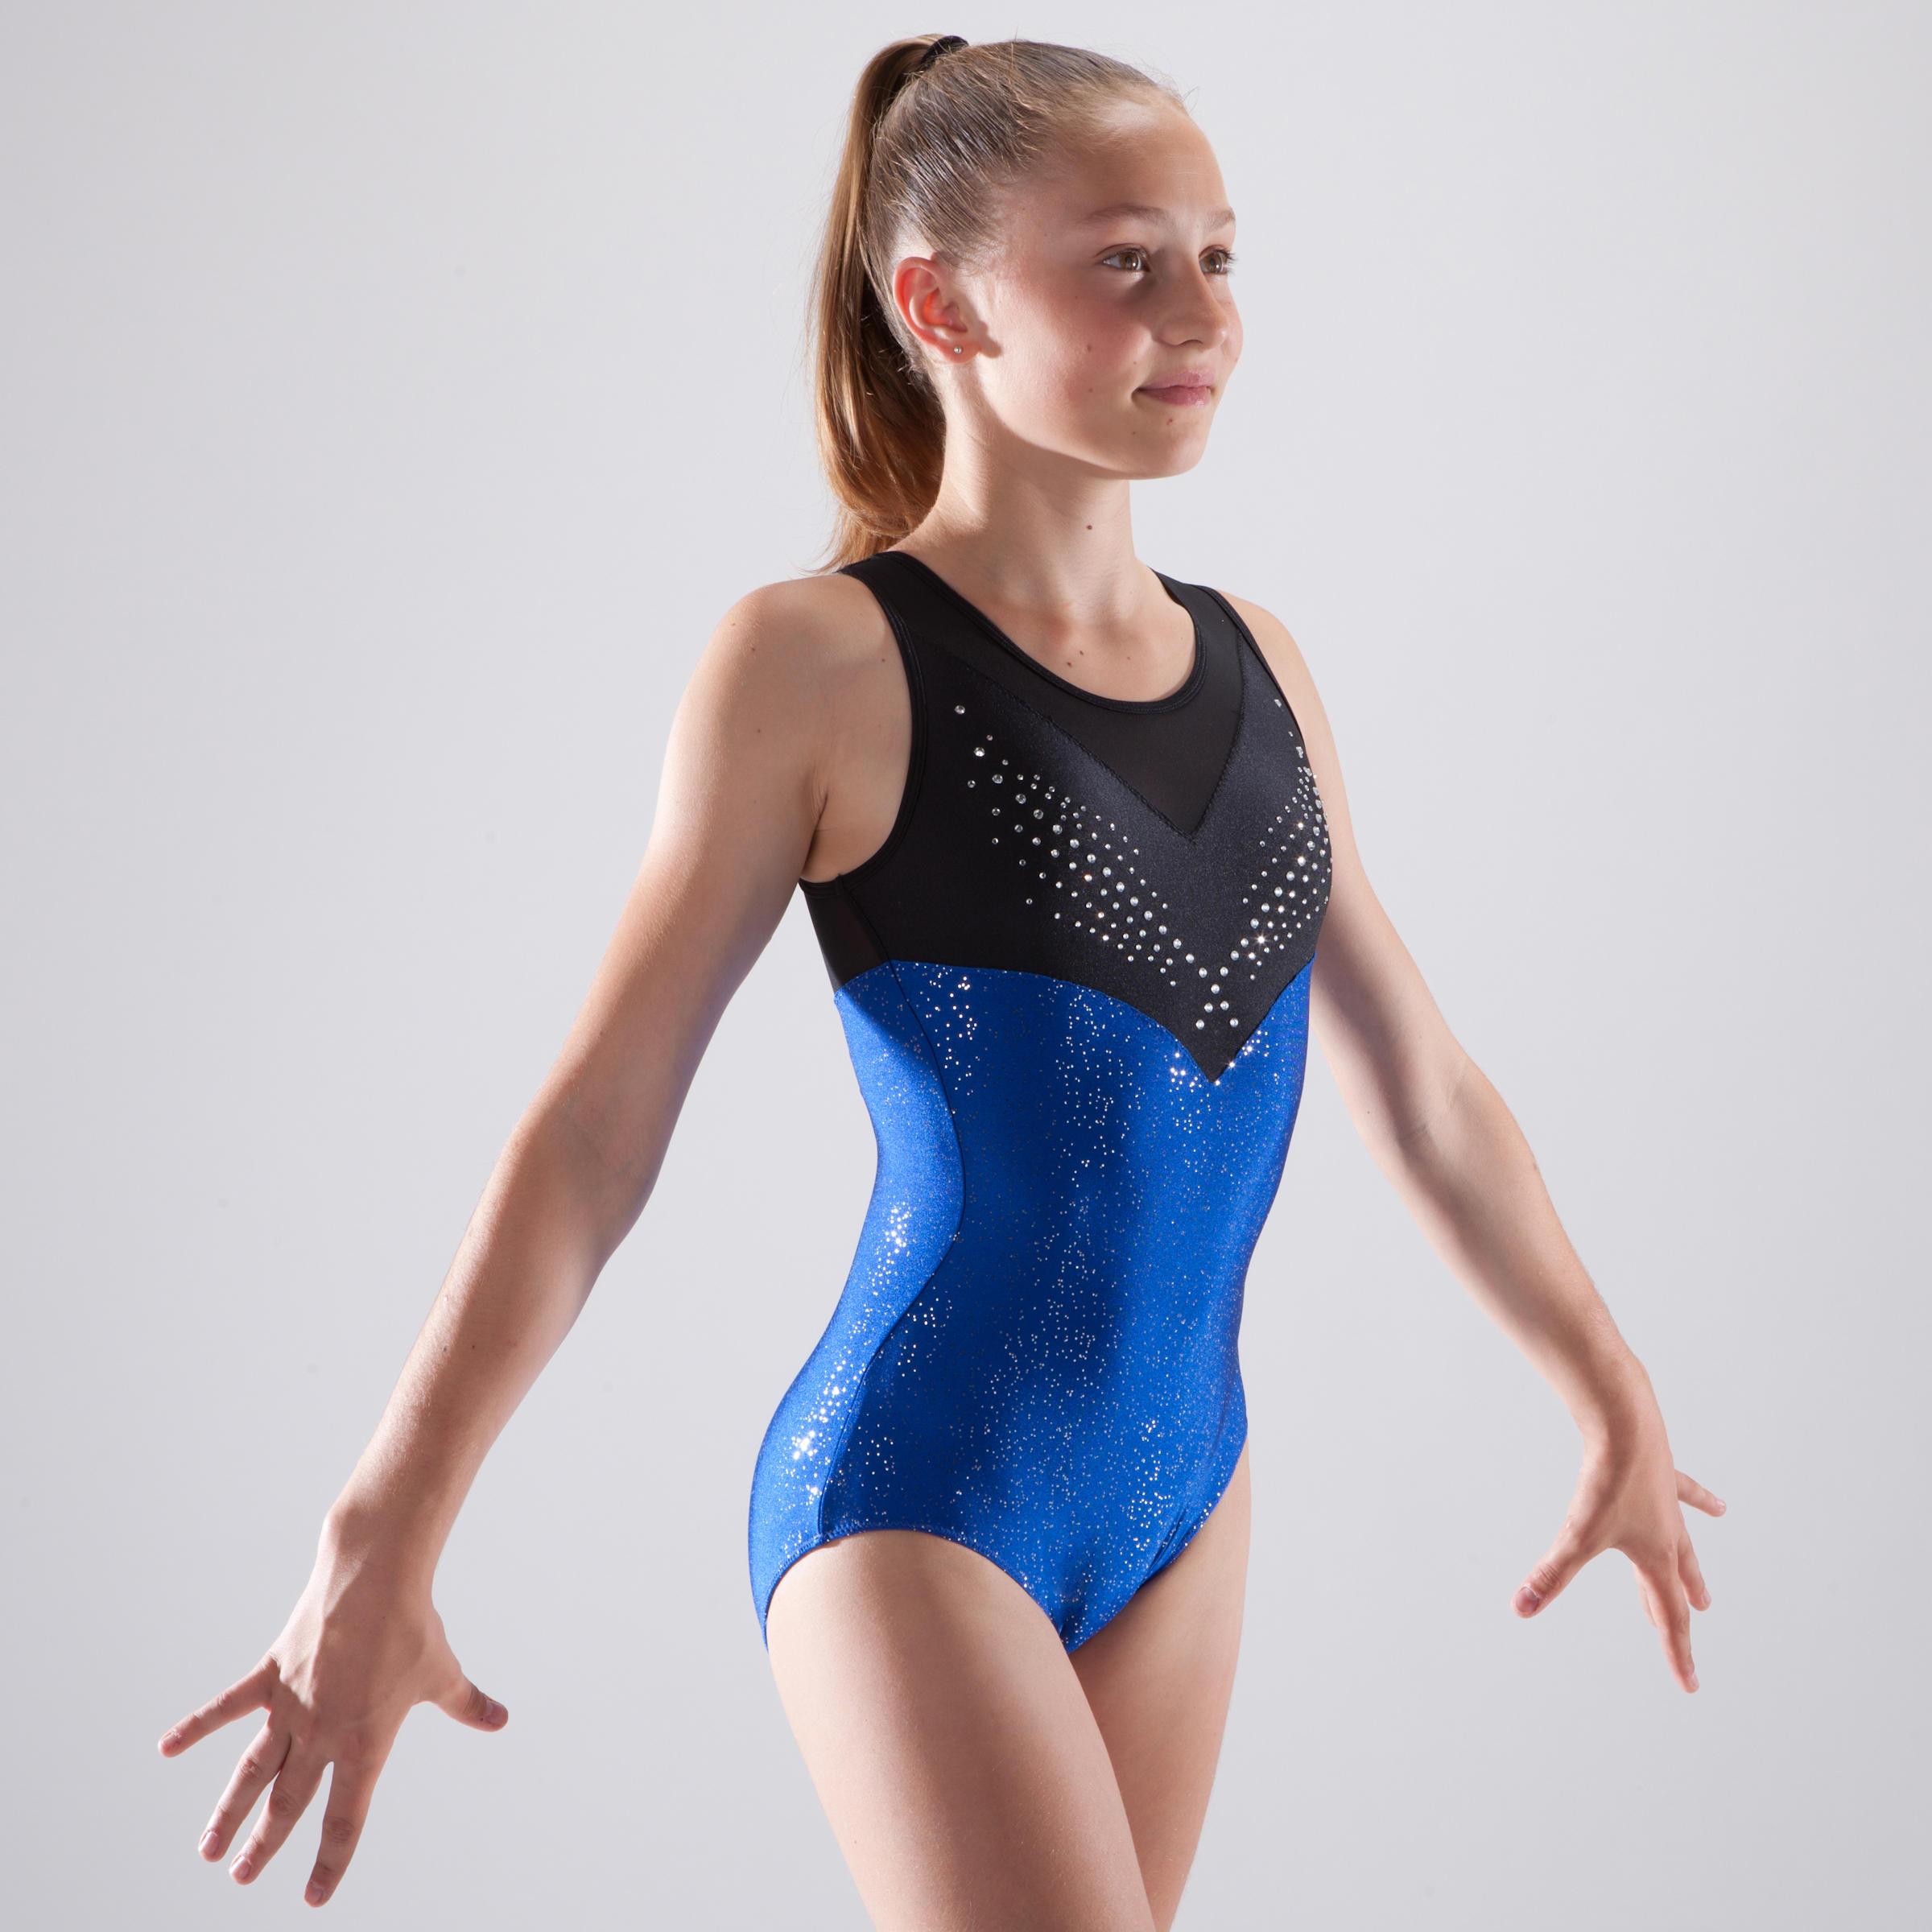 Girls' Artistic Gymnastics Sleeveless Leotard - Blue/Rhinestones